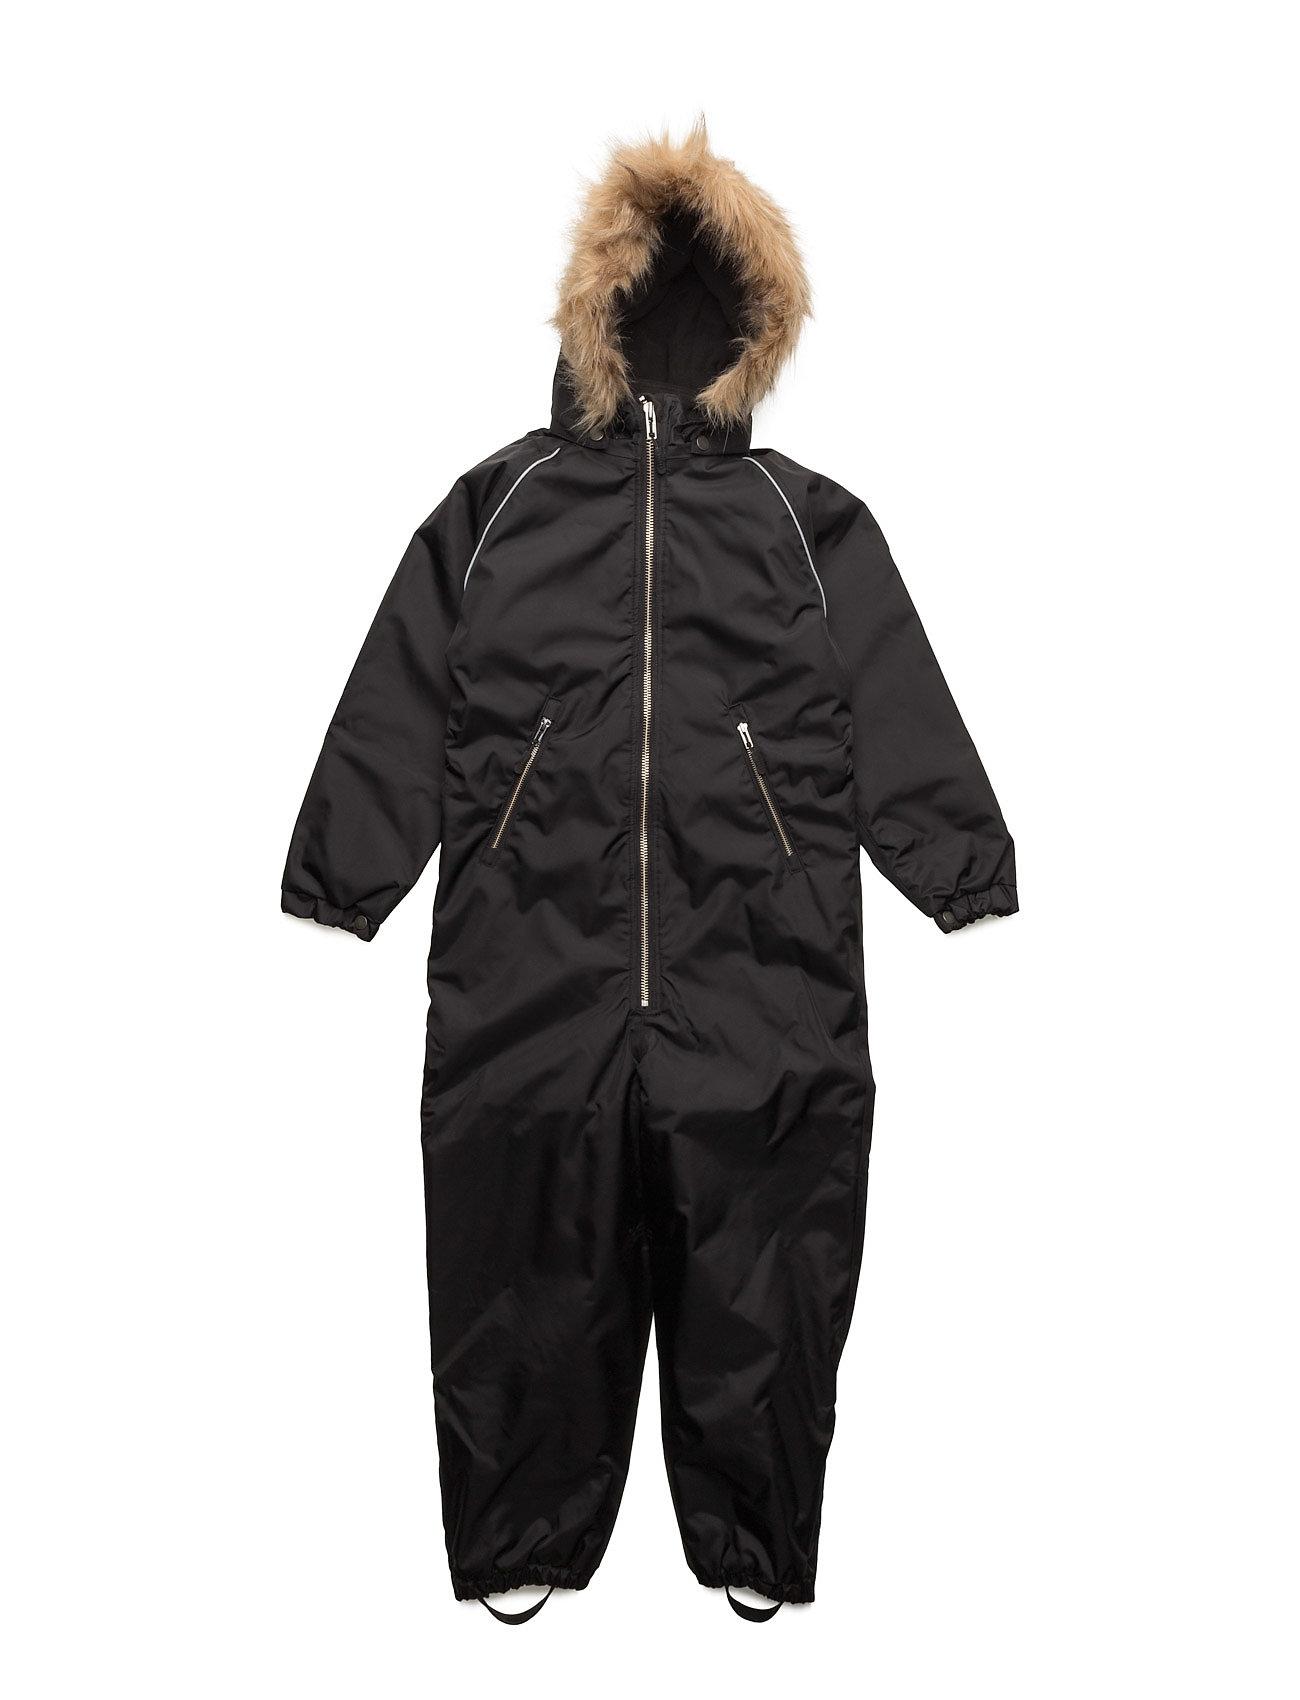 057ebcf1 Find Suit Snowbaggie With Detachable Hood Ticket to Heaven Overalls i til  Børn hos Boozt